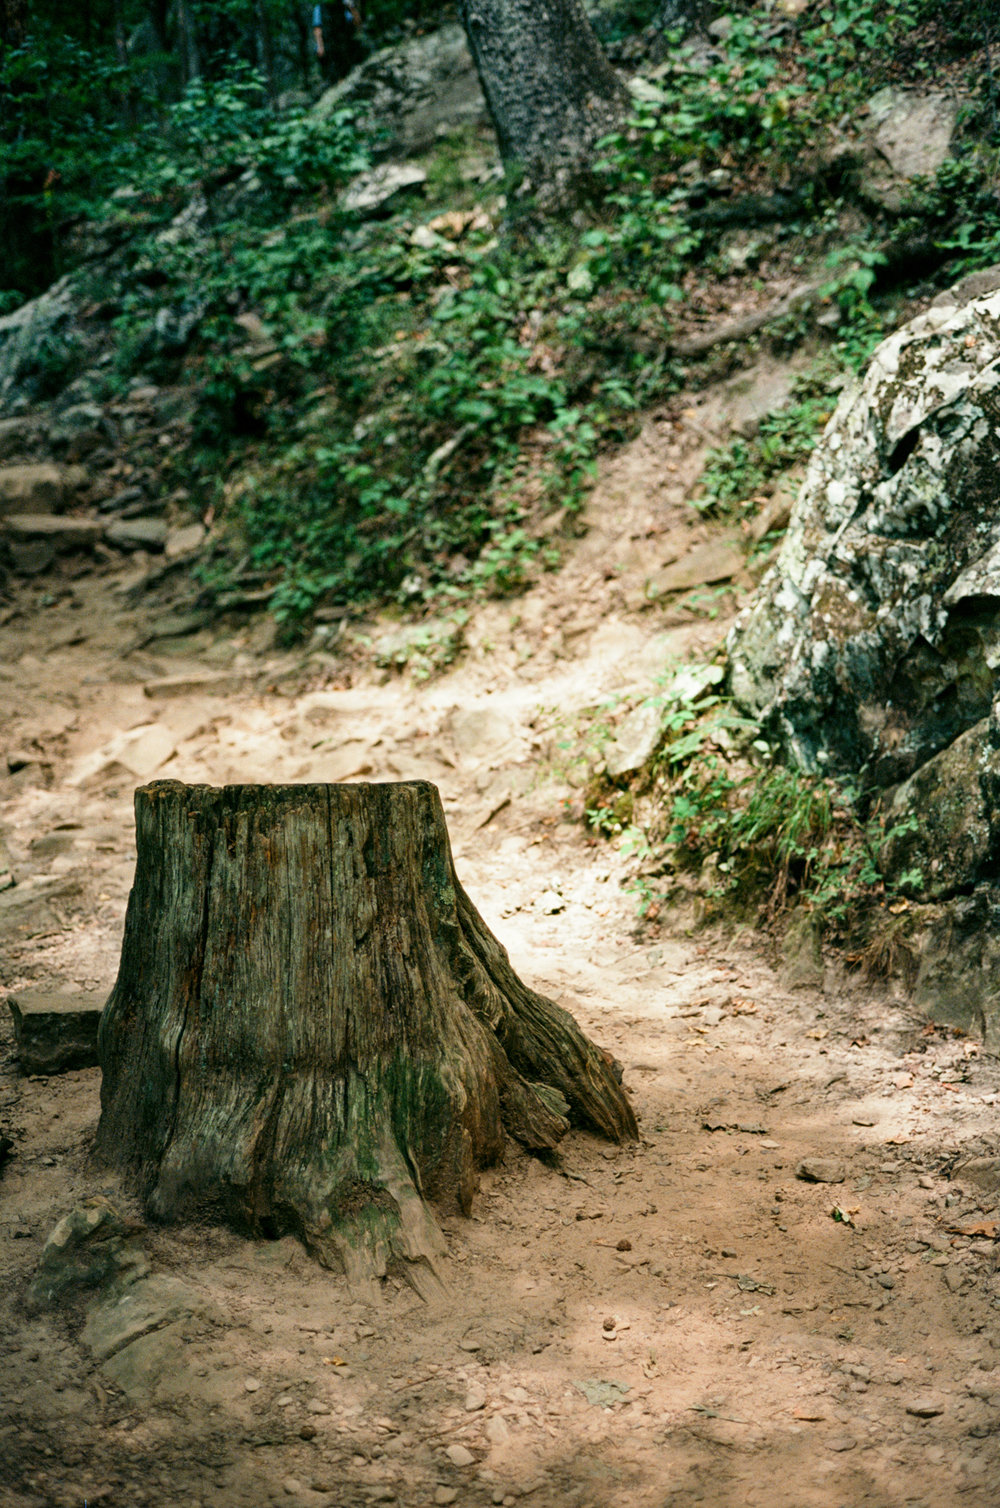 petit-jean-stgate-park-film-thewarmtharoundyou-camping-trip (36 of 37).jpg